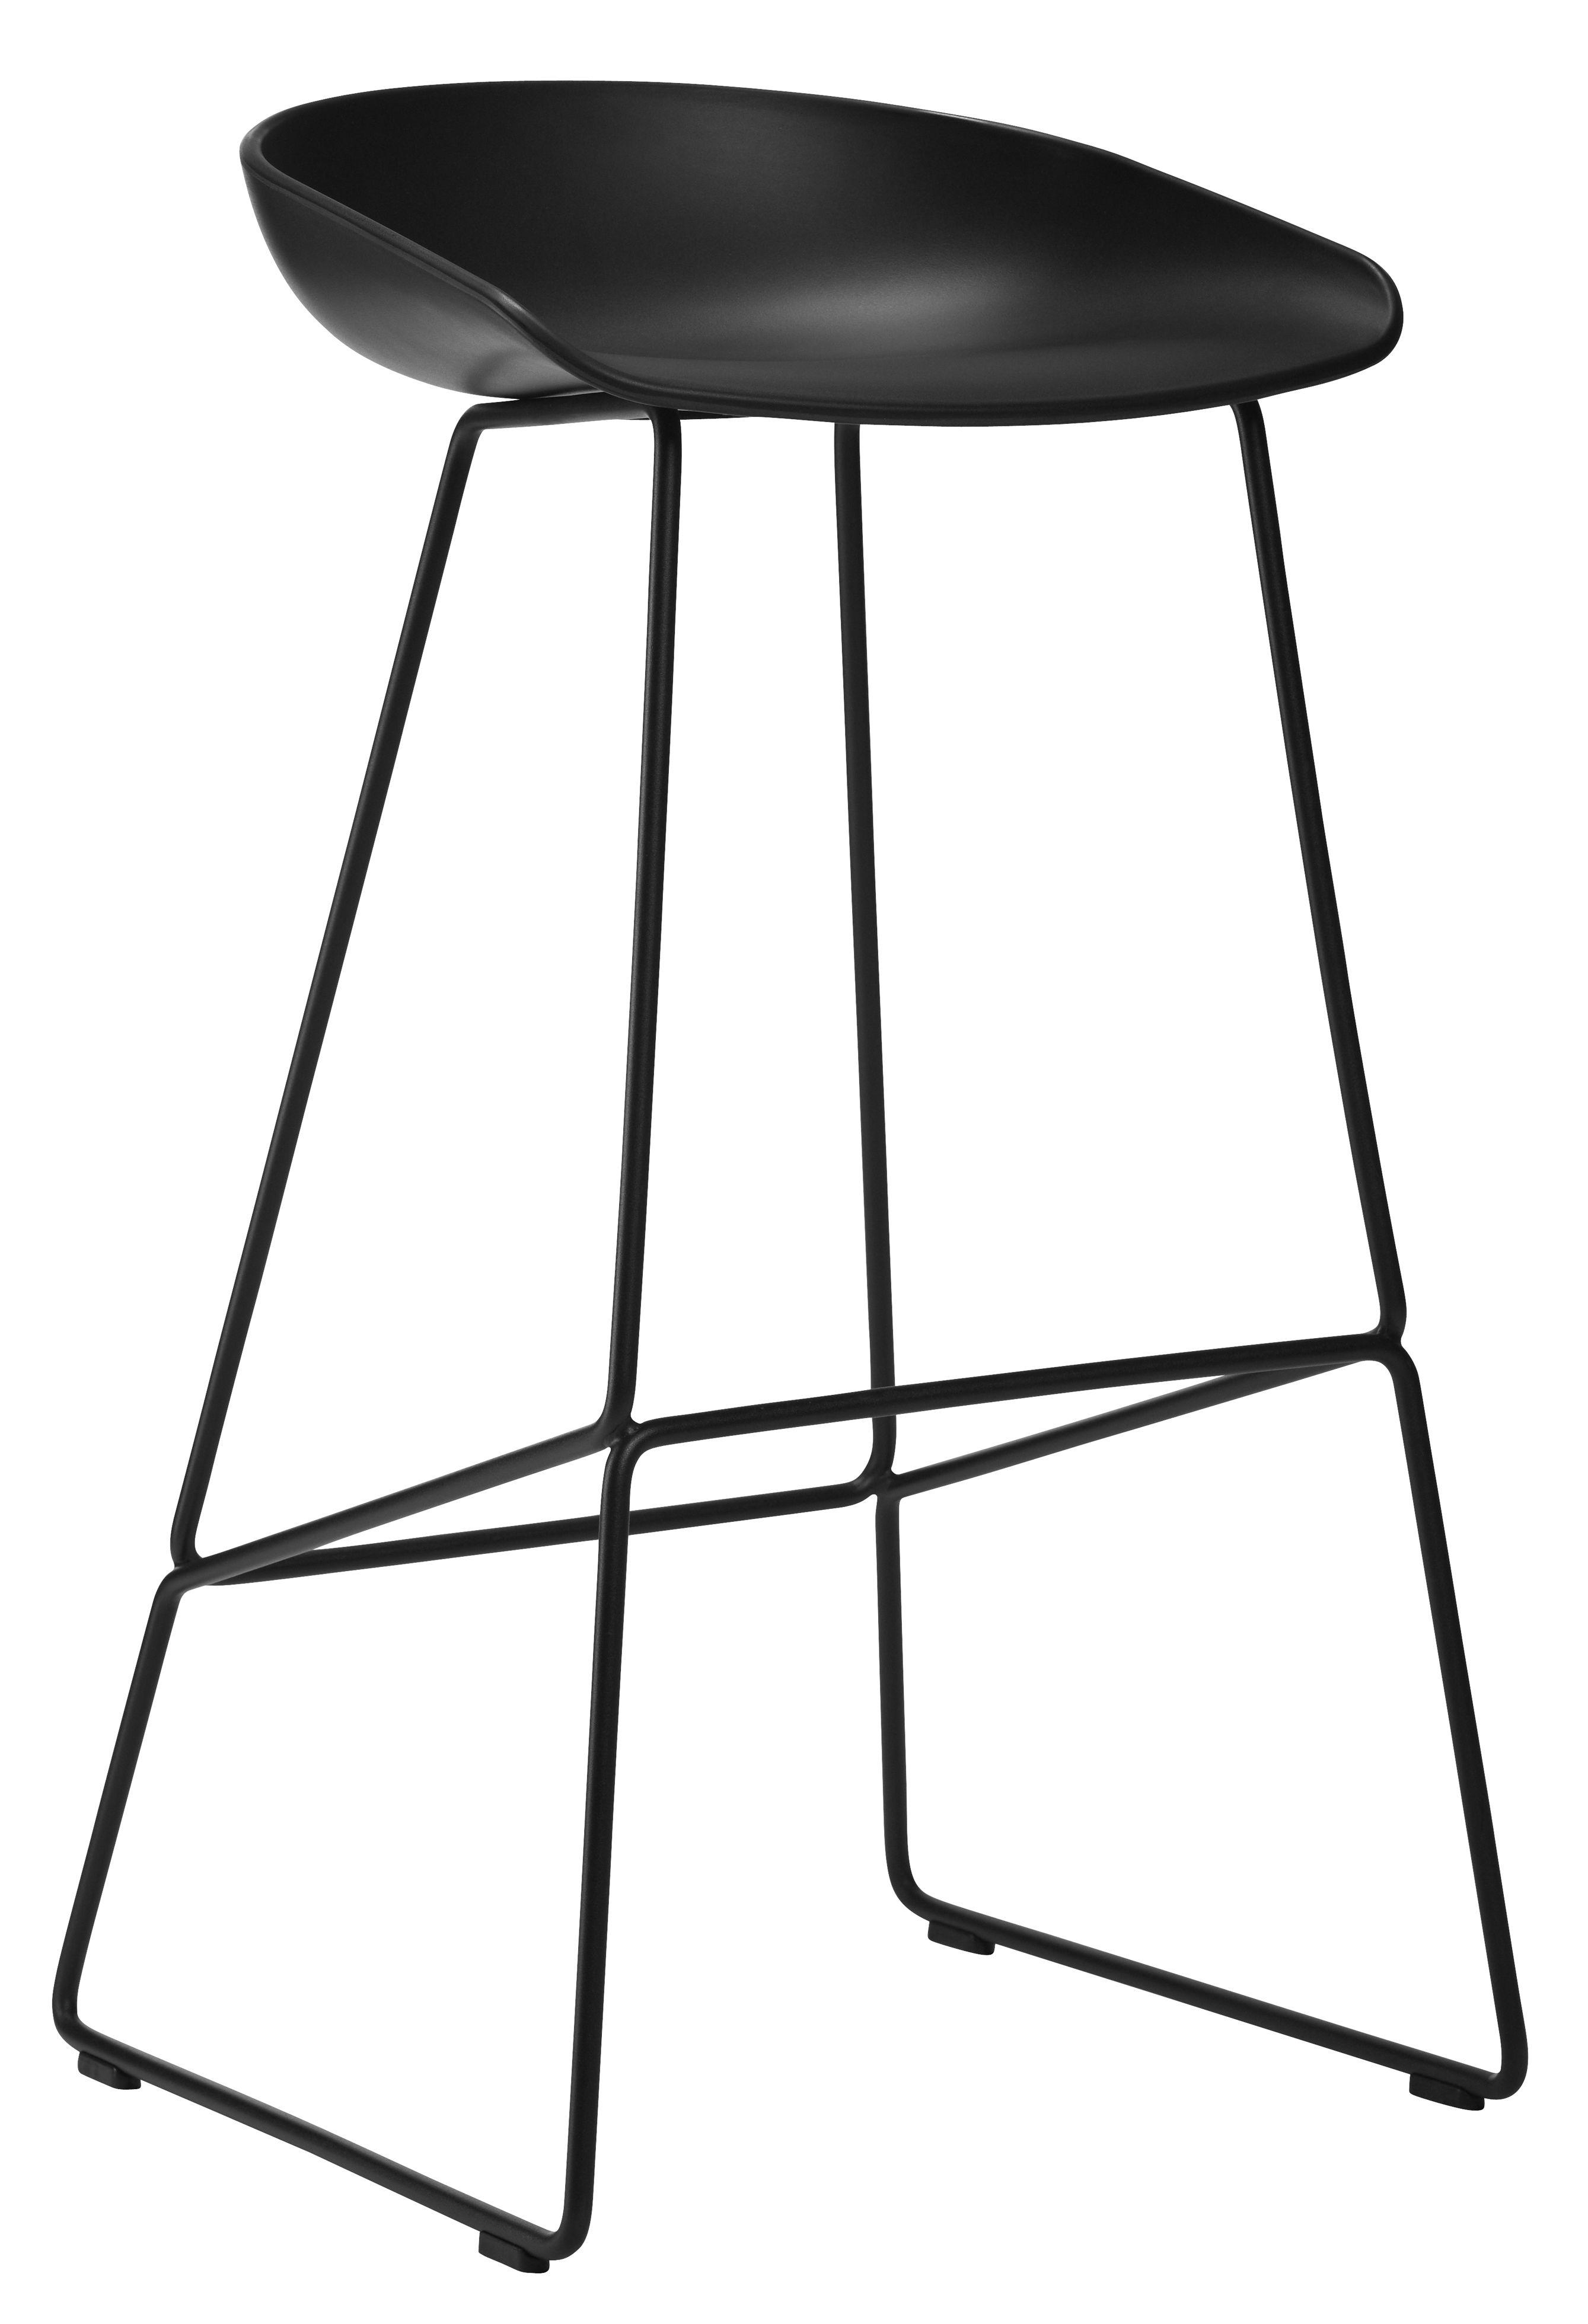 Möbel - Barhocker - About a stool AAS 38 Barhocker / H 75 cm - Kufengestell aus Stahl - Hay - Schwarz - Polypropylen, Stahl